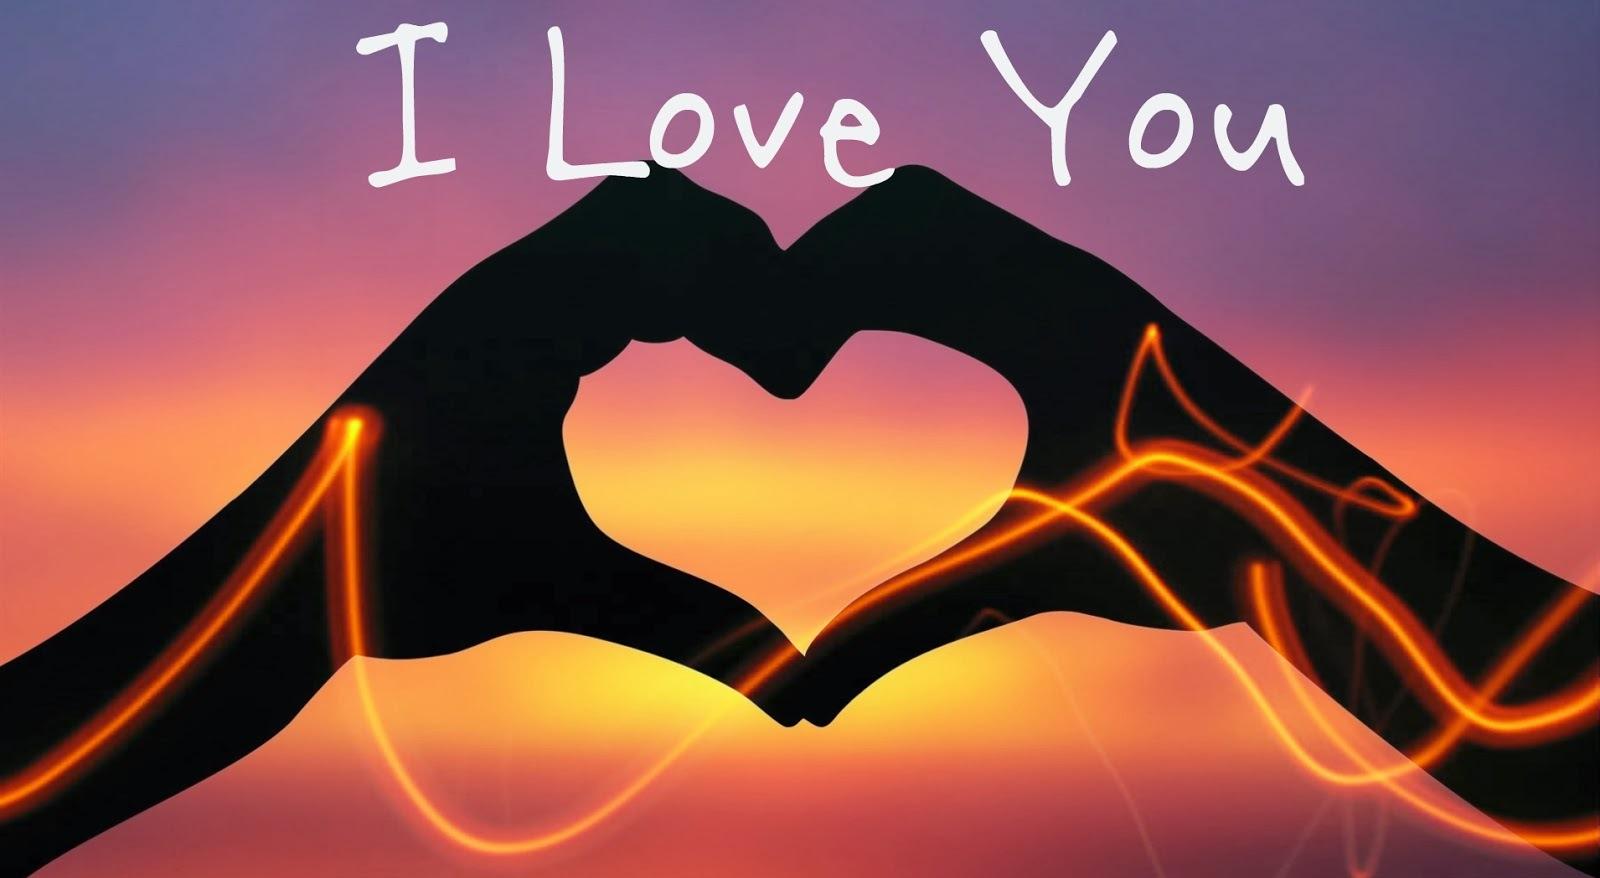 I-love-you-HD-Wallpaper-HVD